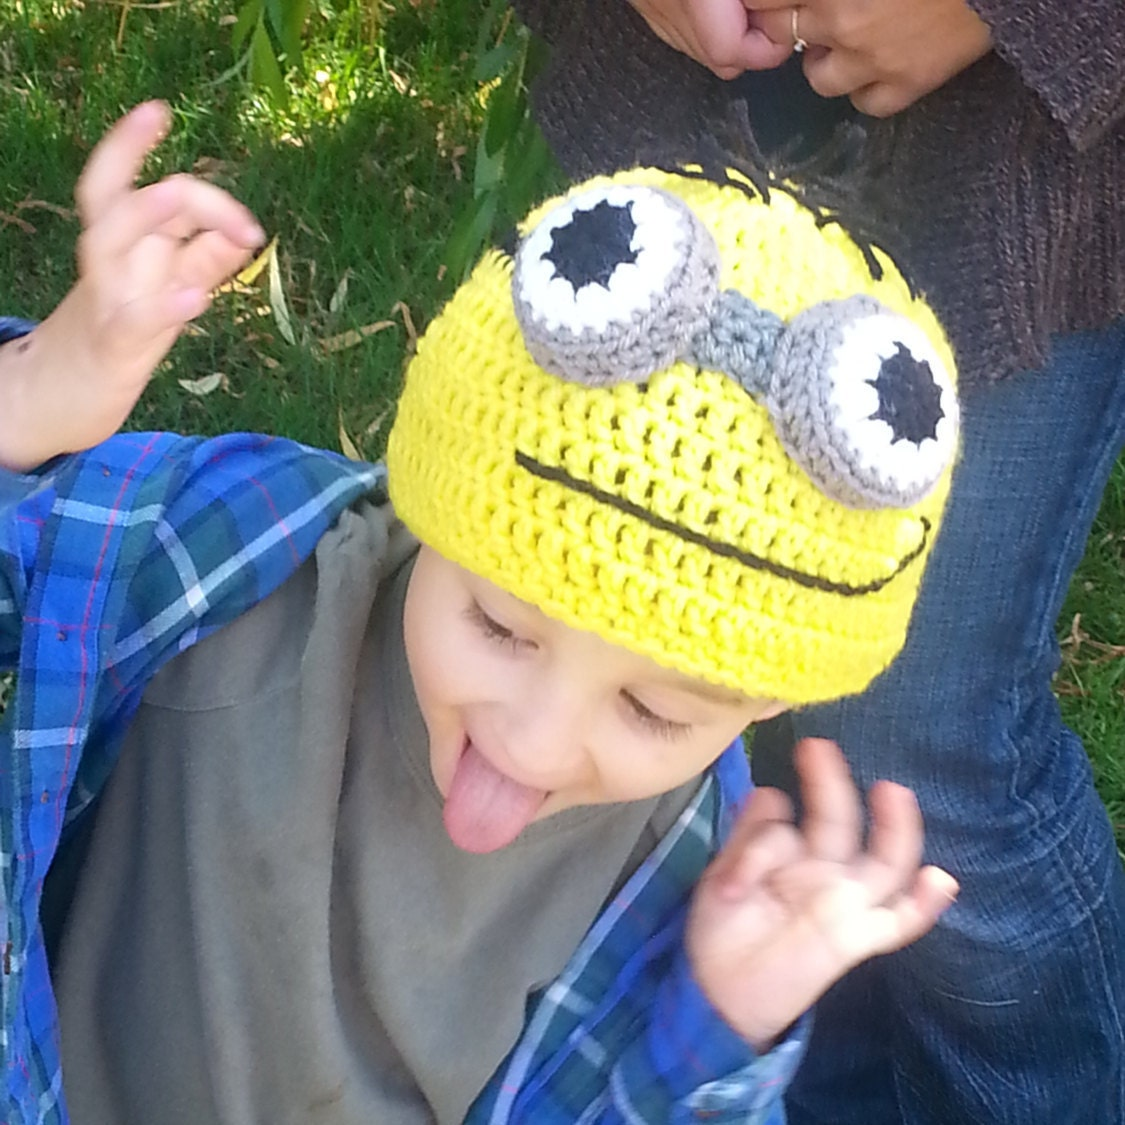 Günstling Hut Kinder häkeln Beanie Handarbeit Häkelhut